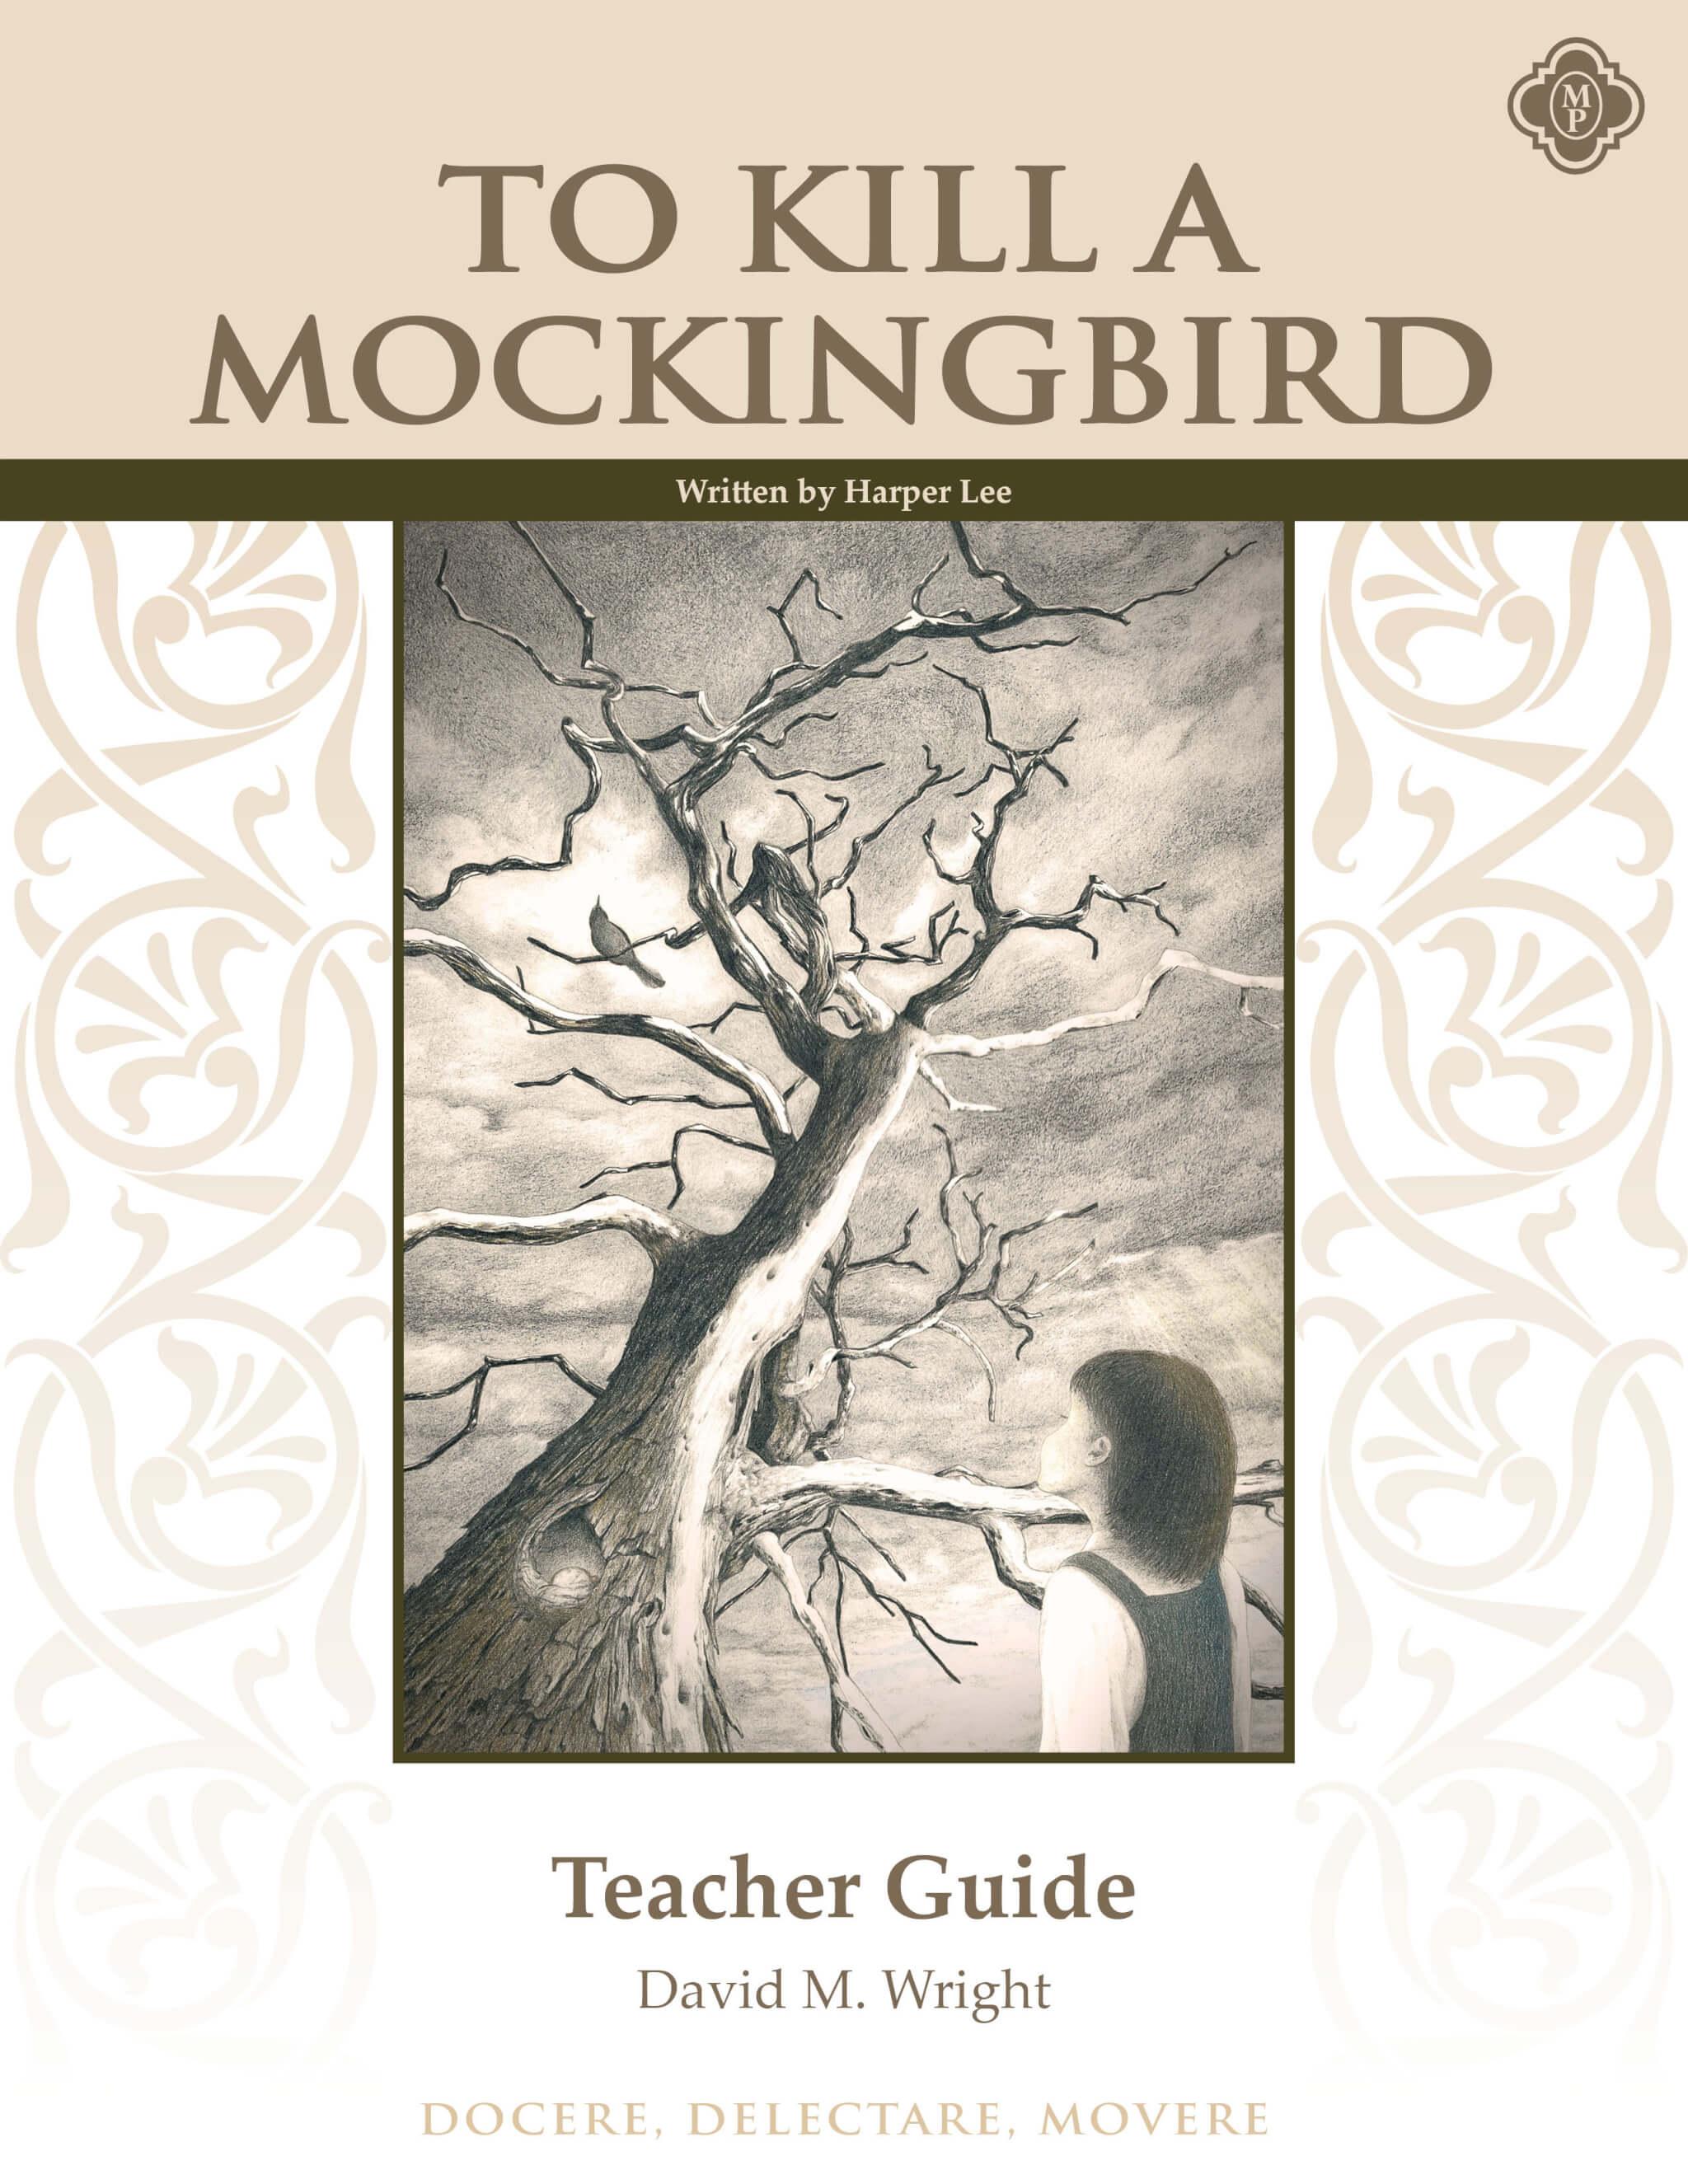 To Kill A Mockingbird Teacher Manual, Second Edition | Memoria Press